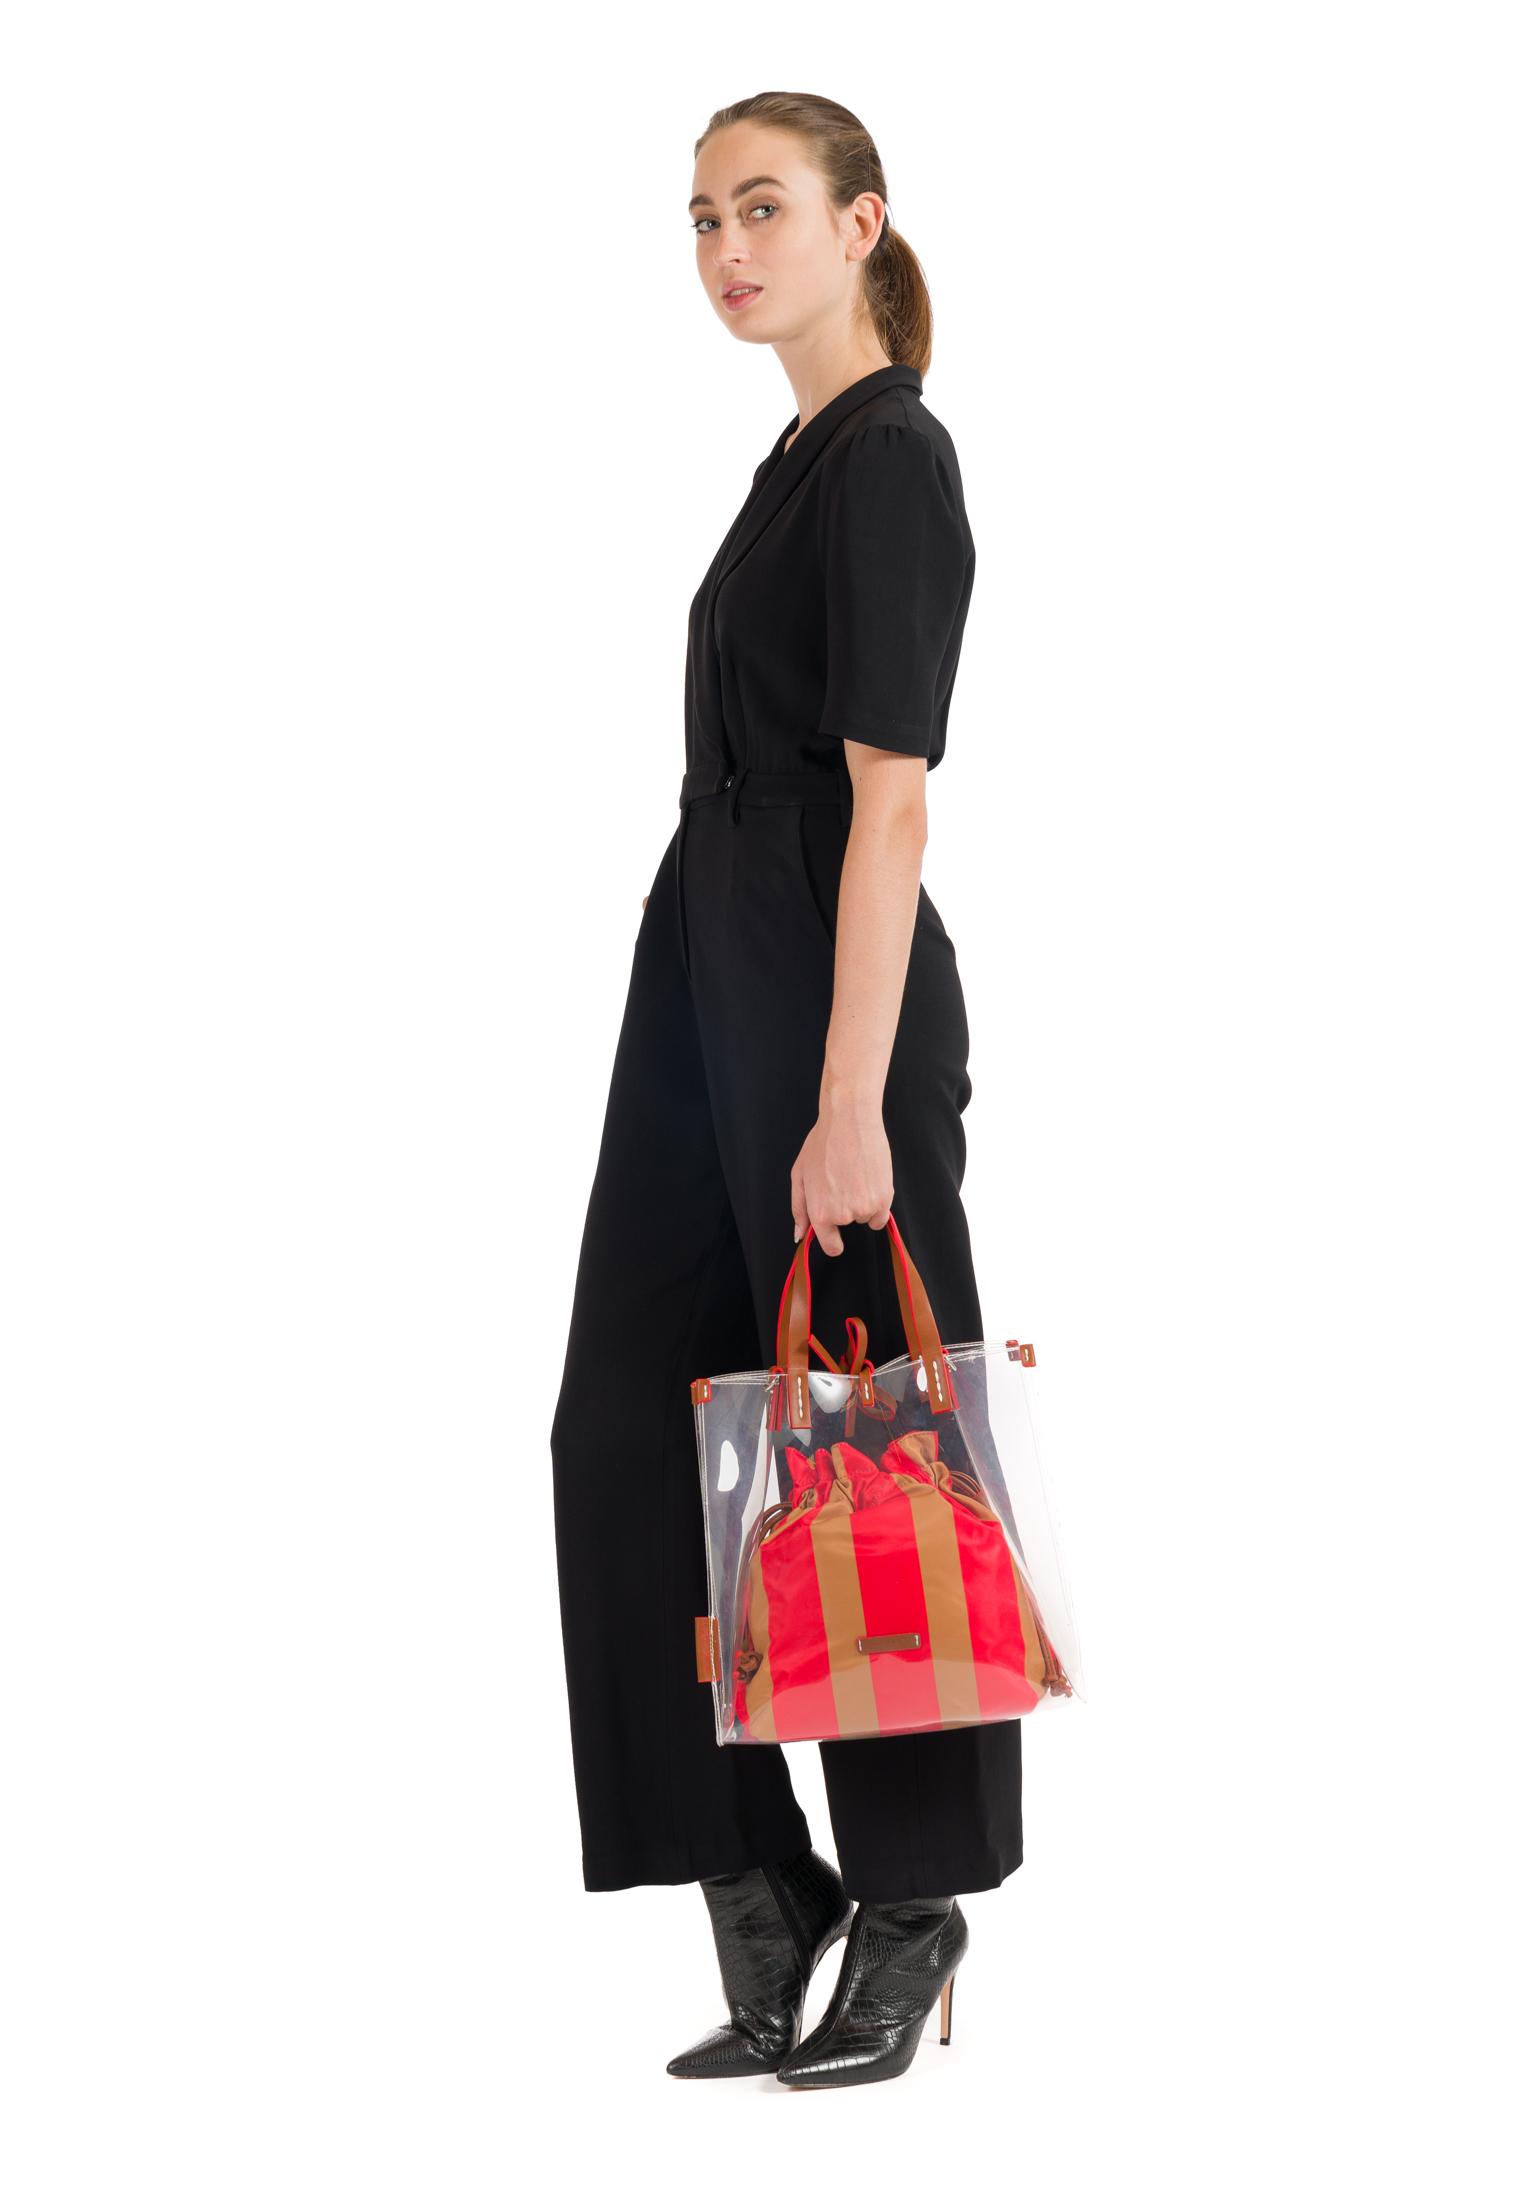 Shopper SURI Black Label Gracy mittel